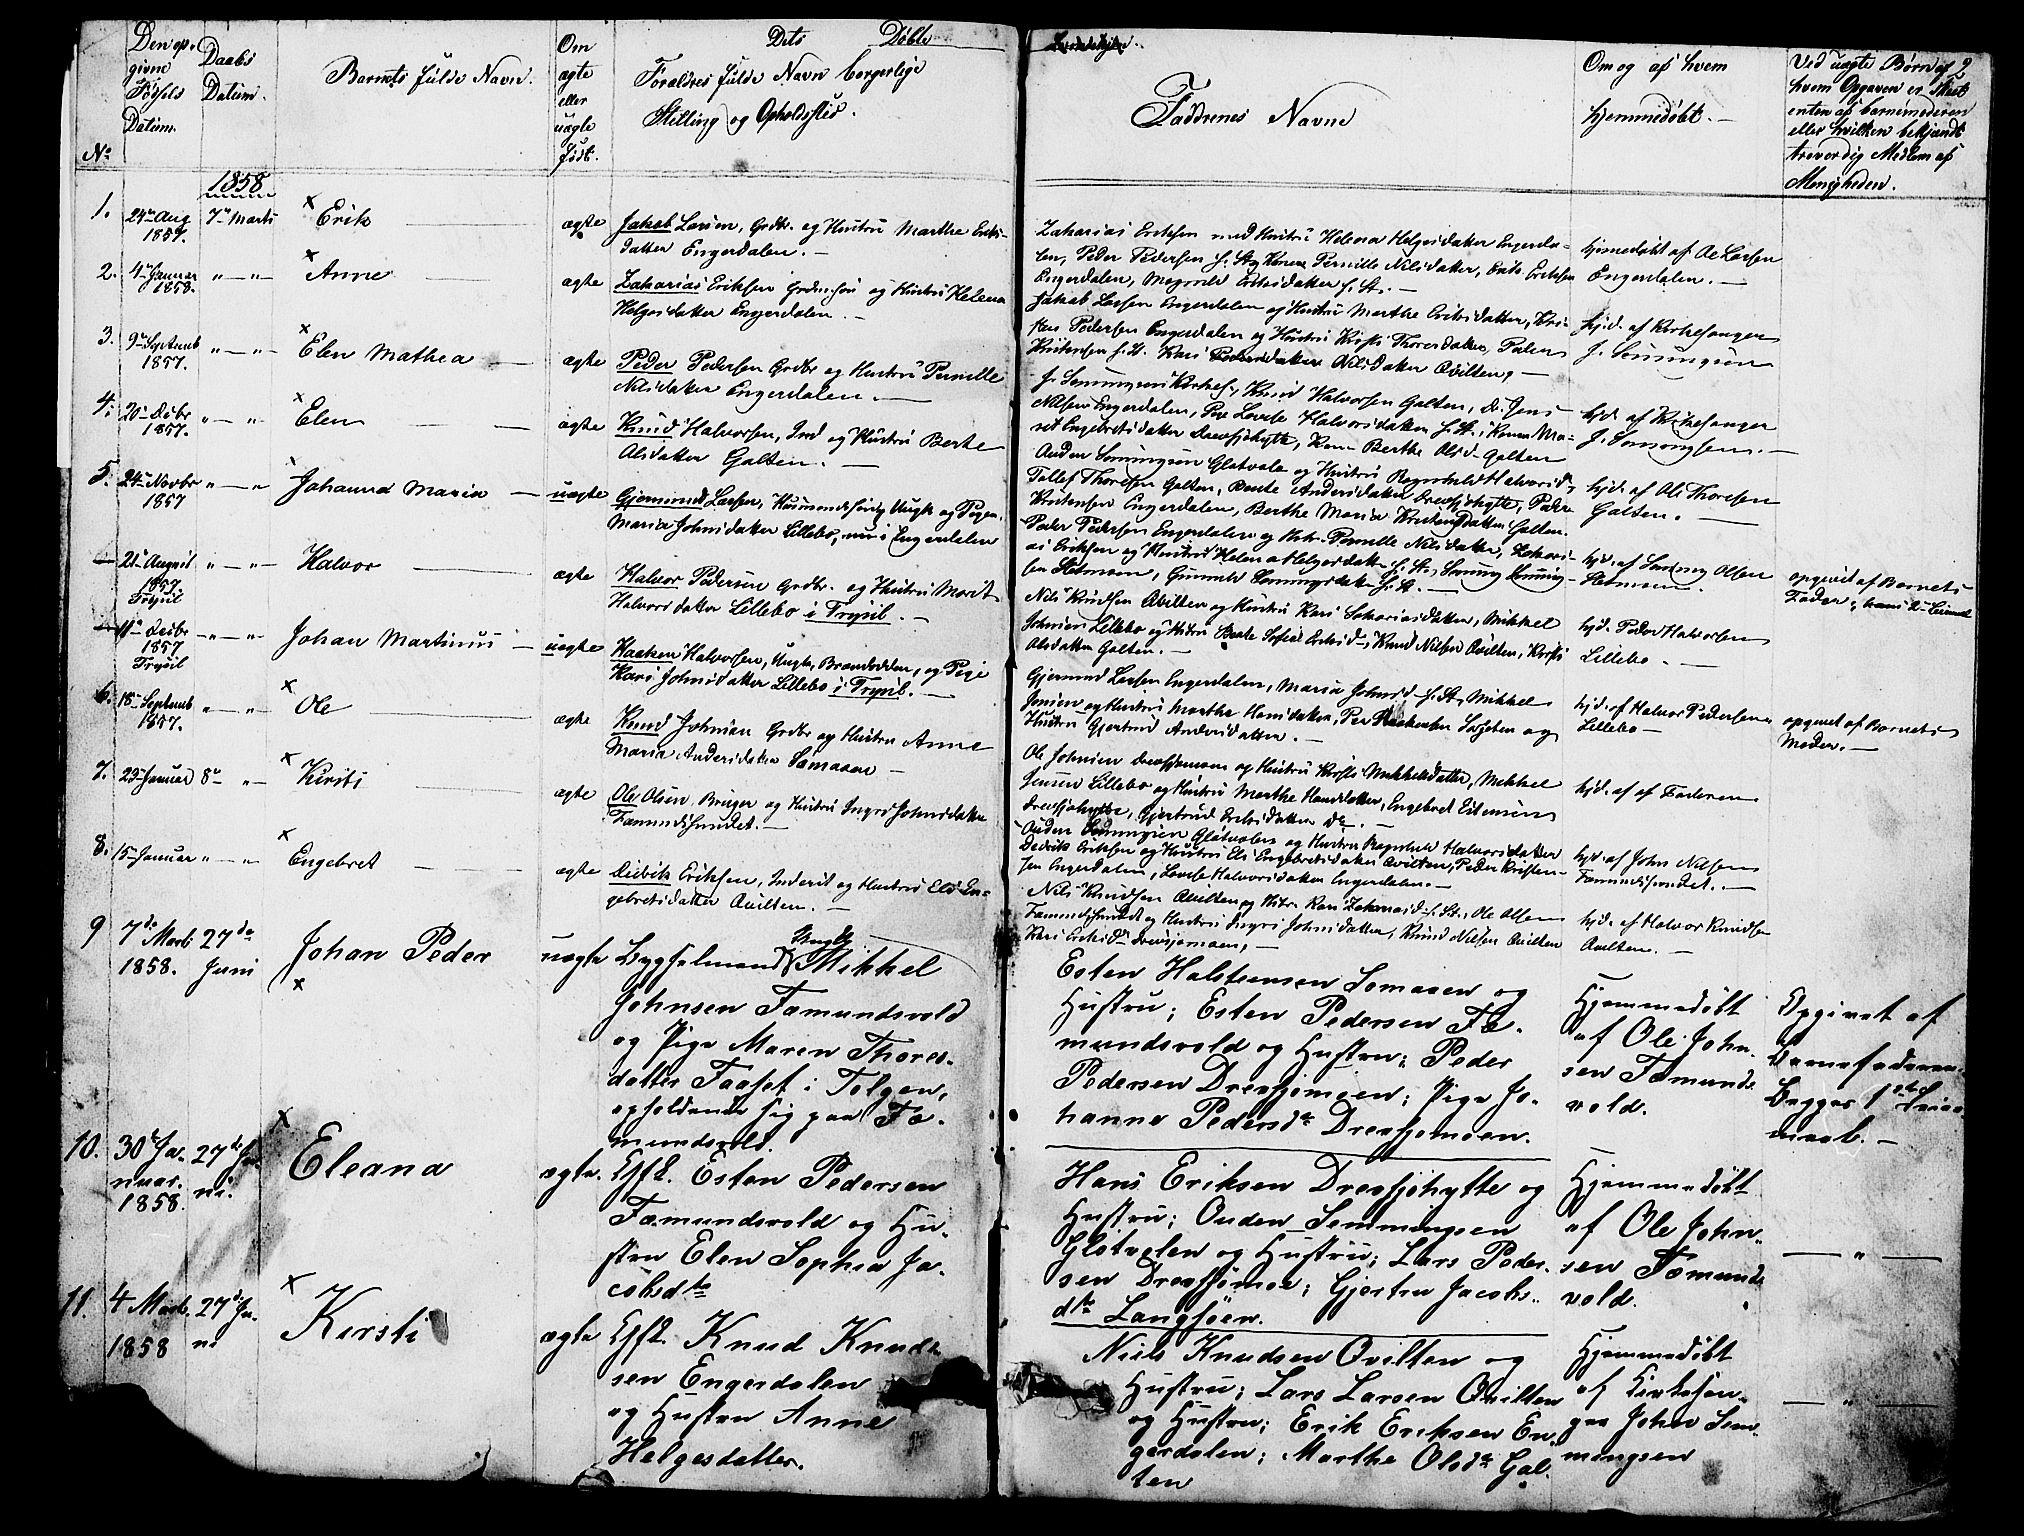 SAH, Rendalen prestekontor, H/Ha/Hab/L0002: Parish register (copy) no. 2, 1858-1880, p. 2